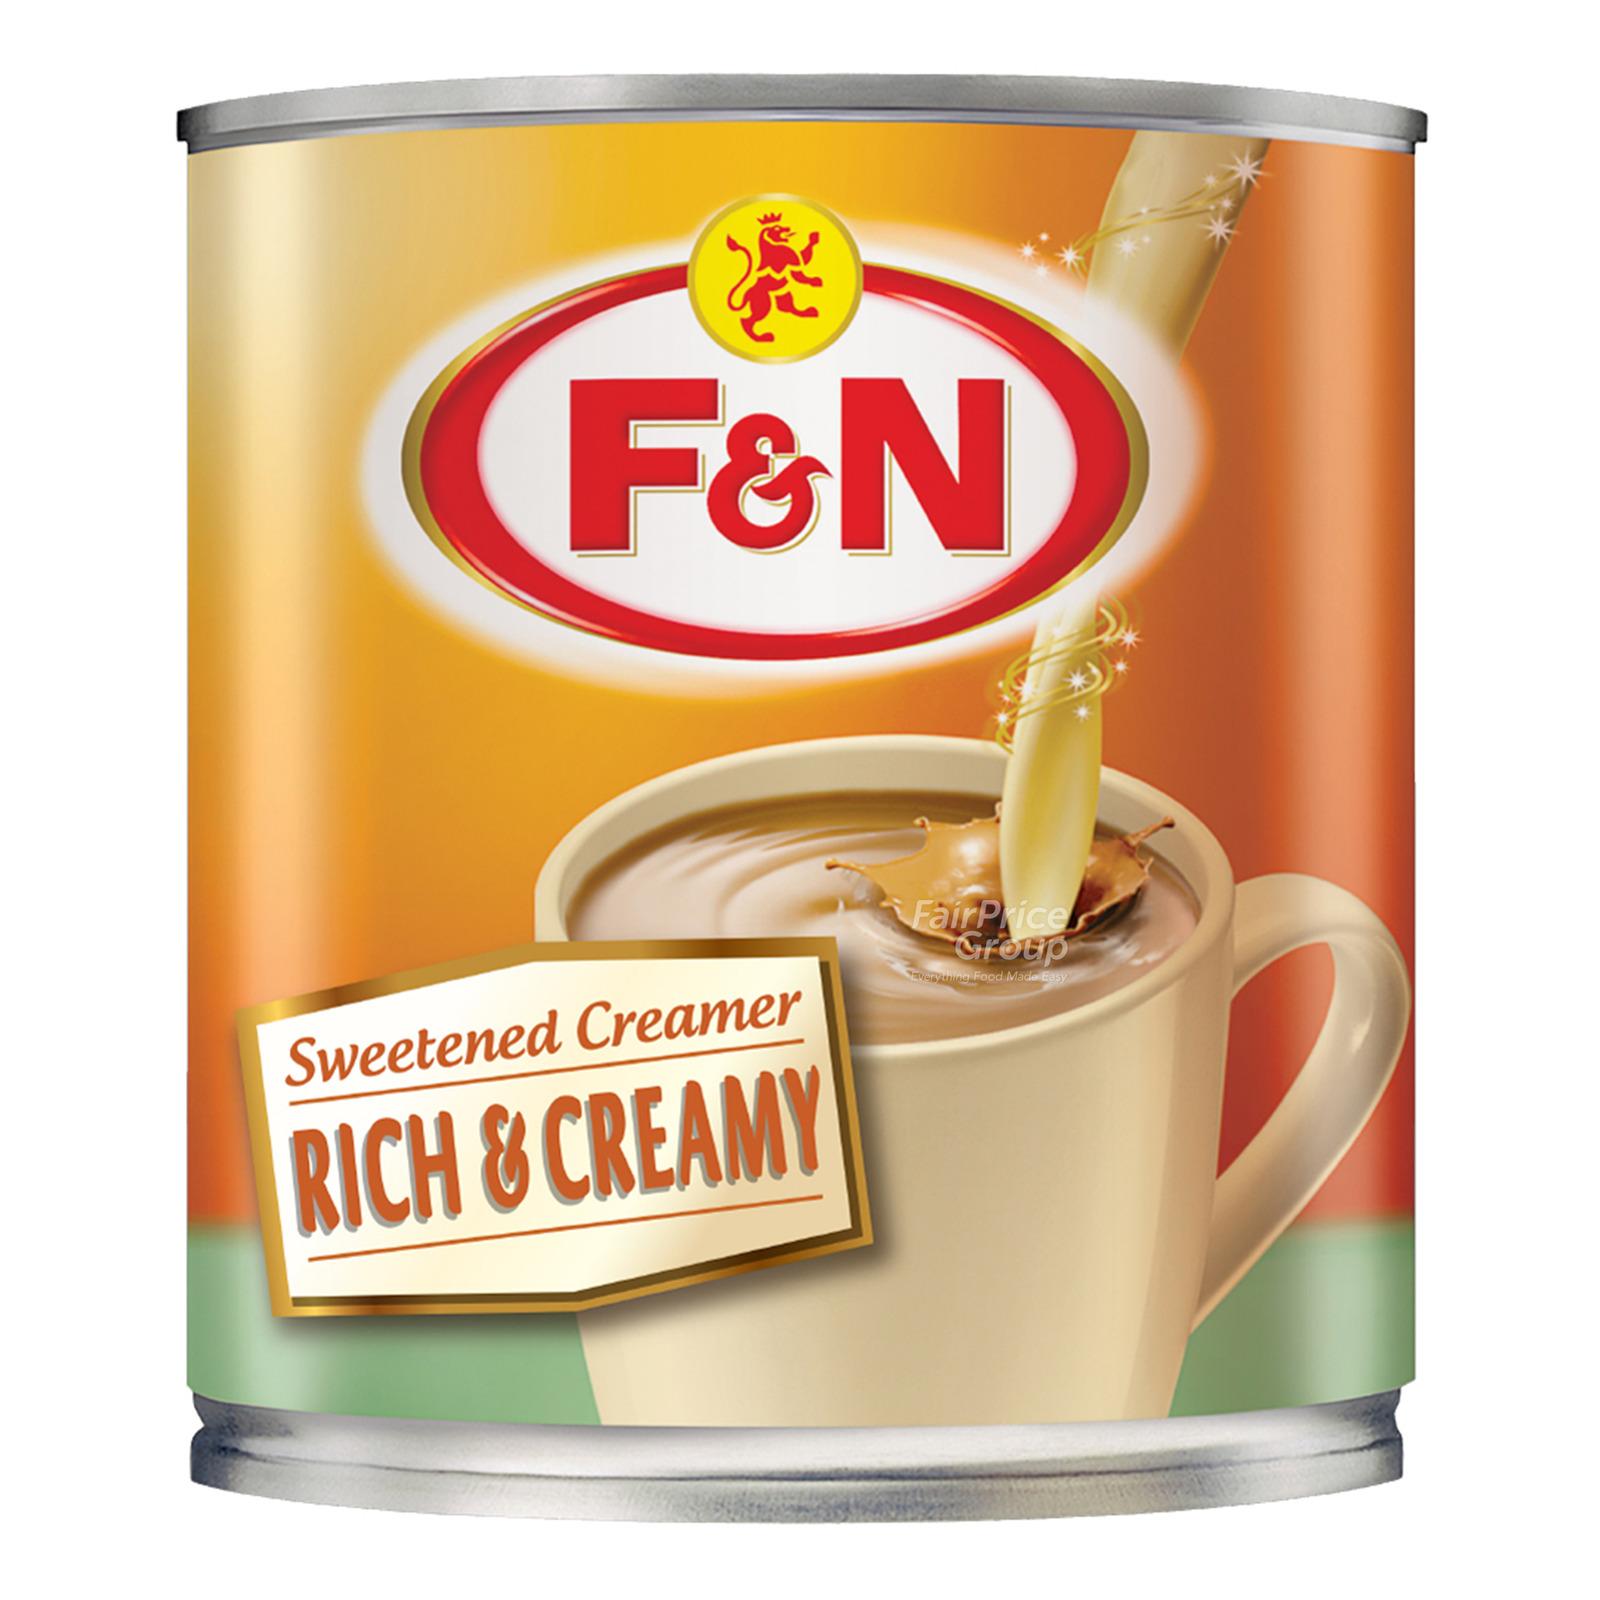 F&N Sweetened Creamer - Rich & Creamy